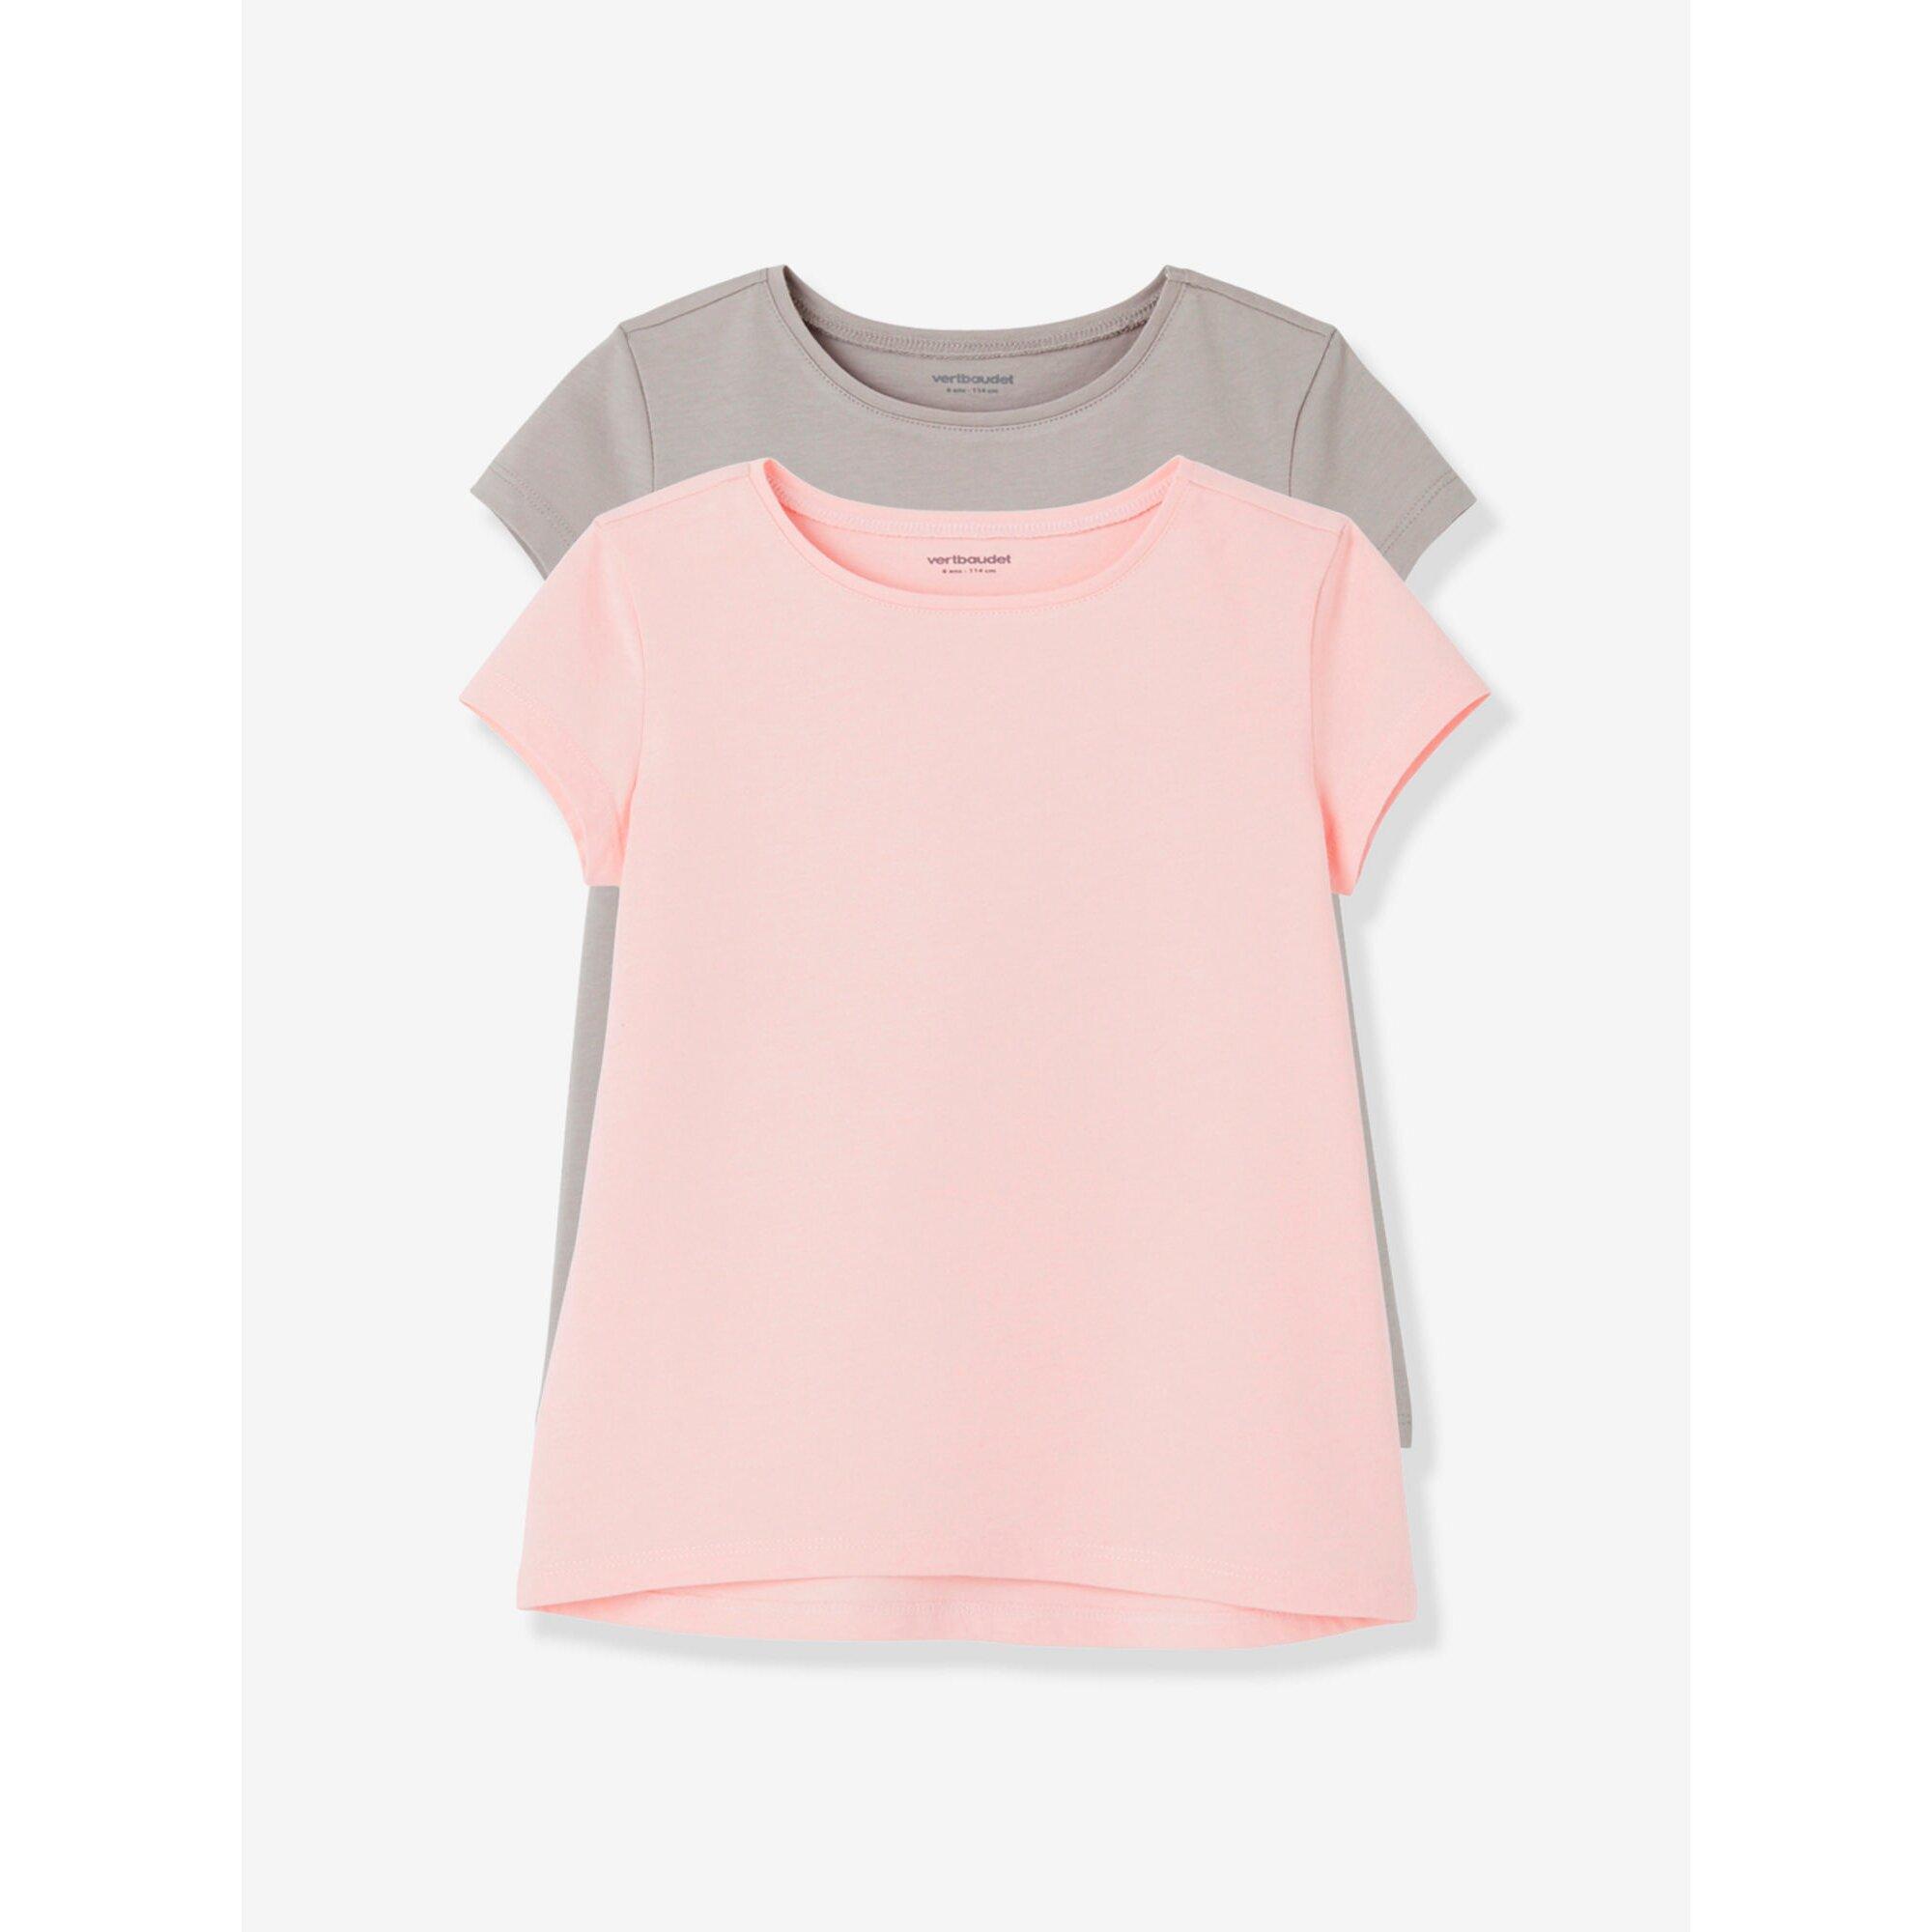 vertbaudet-2er-pack-t-shirts-fur-madchen-rundhals, 8.99 EUR @ babywalz-de